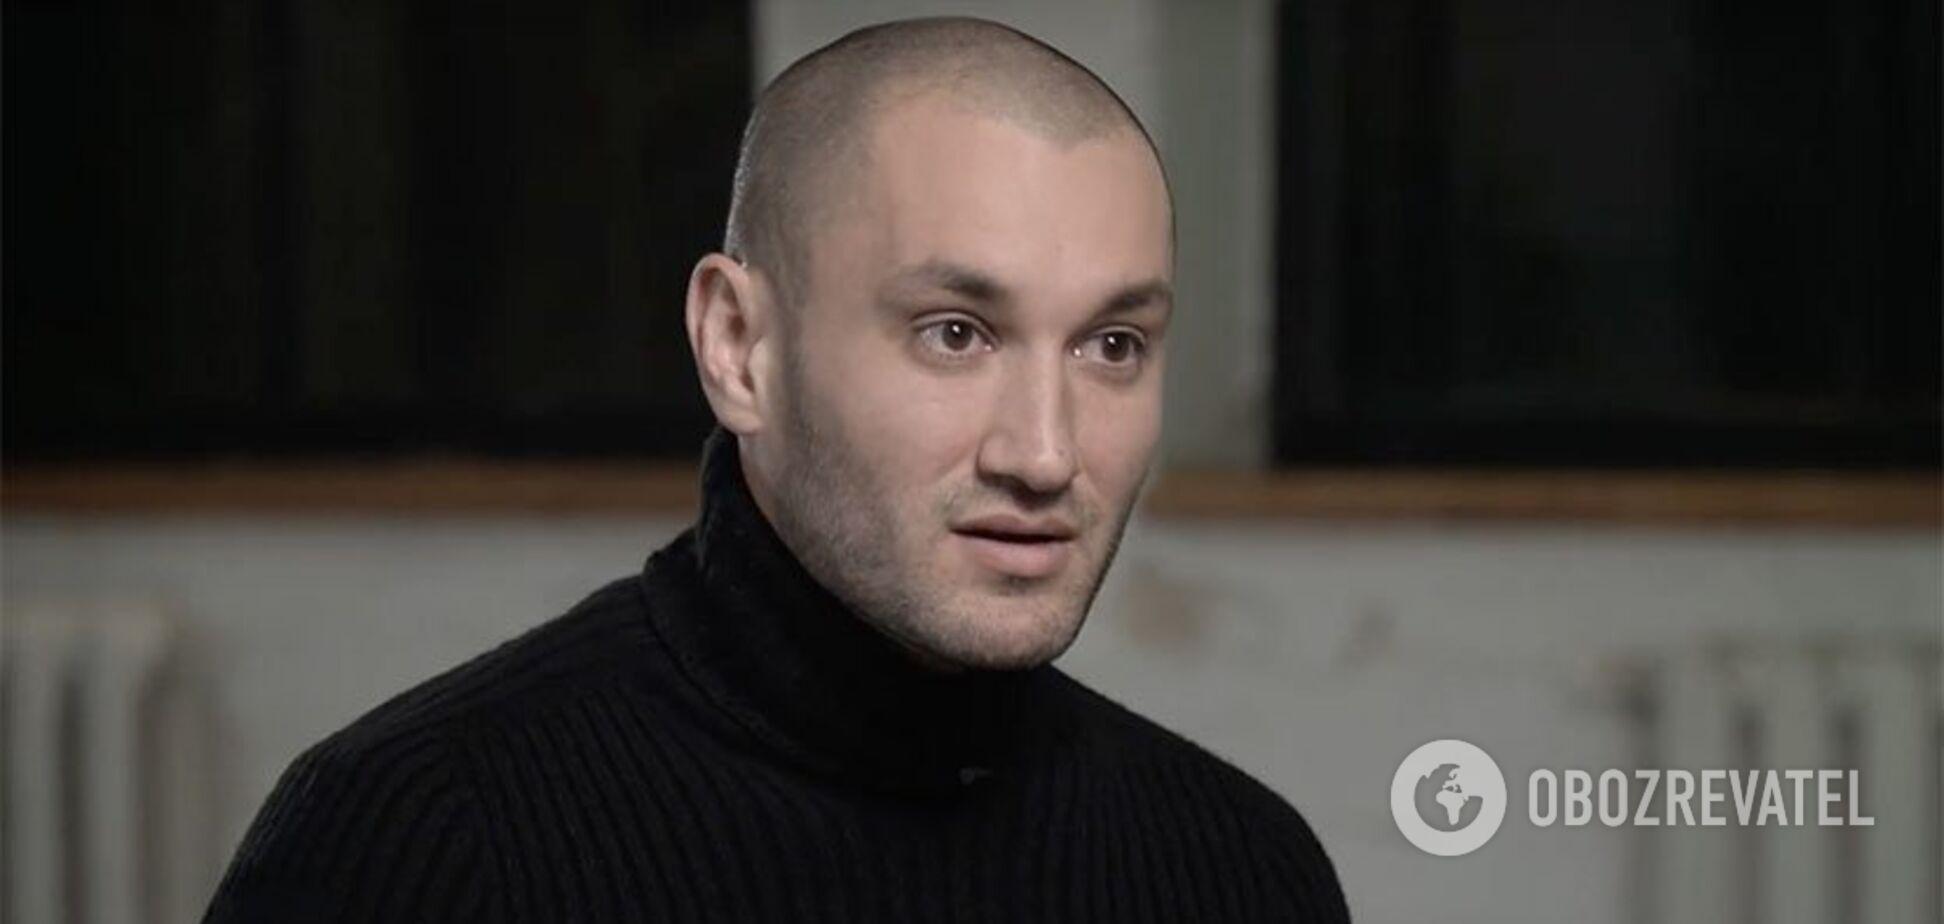 Бардаш попал в 'Миротворец' за cлова Дудю об 'Л/ДНР'